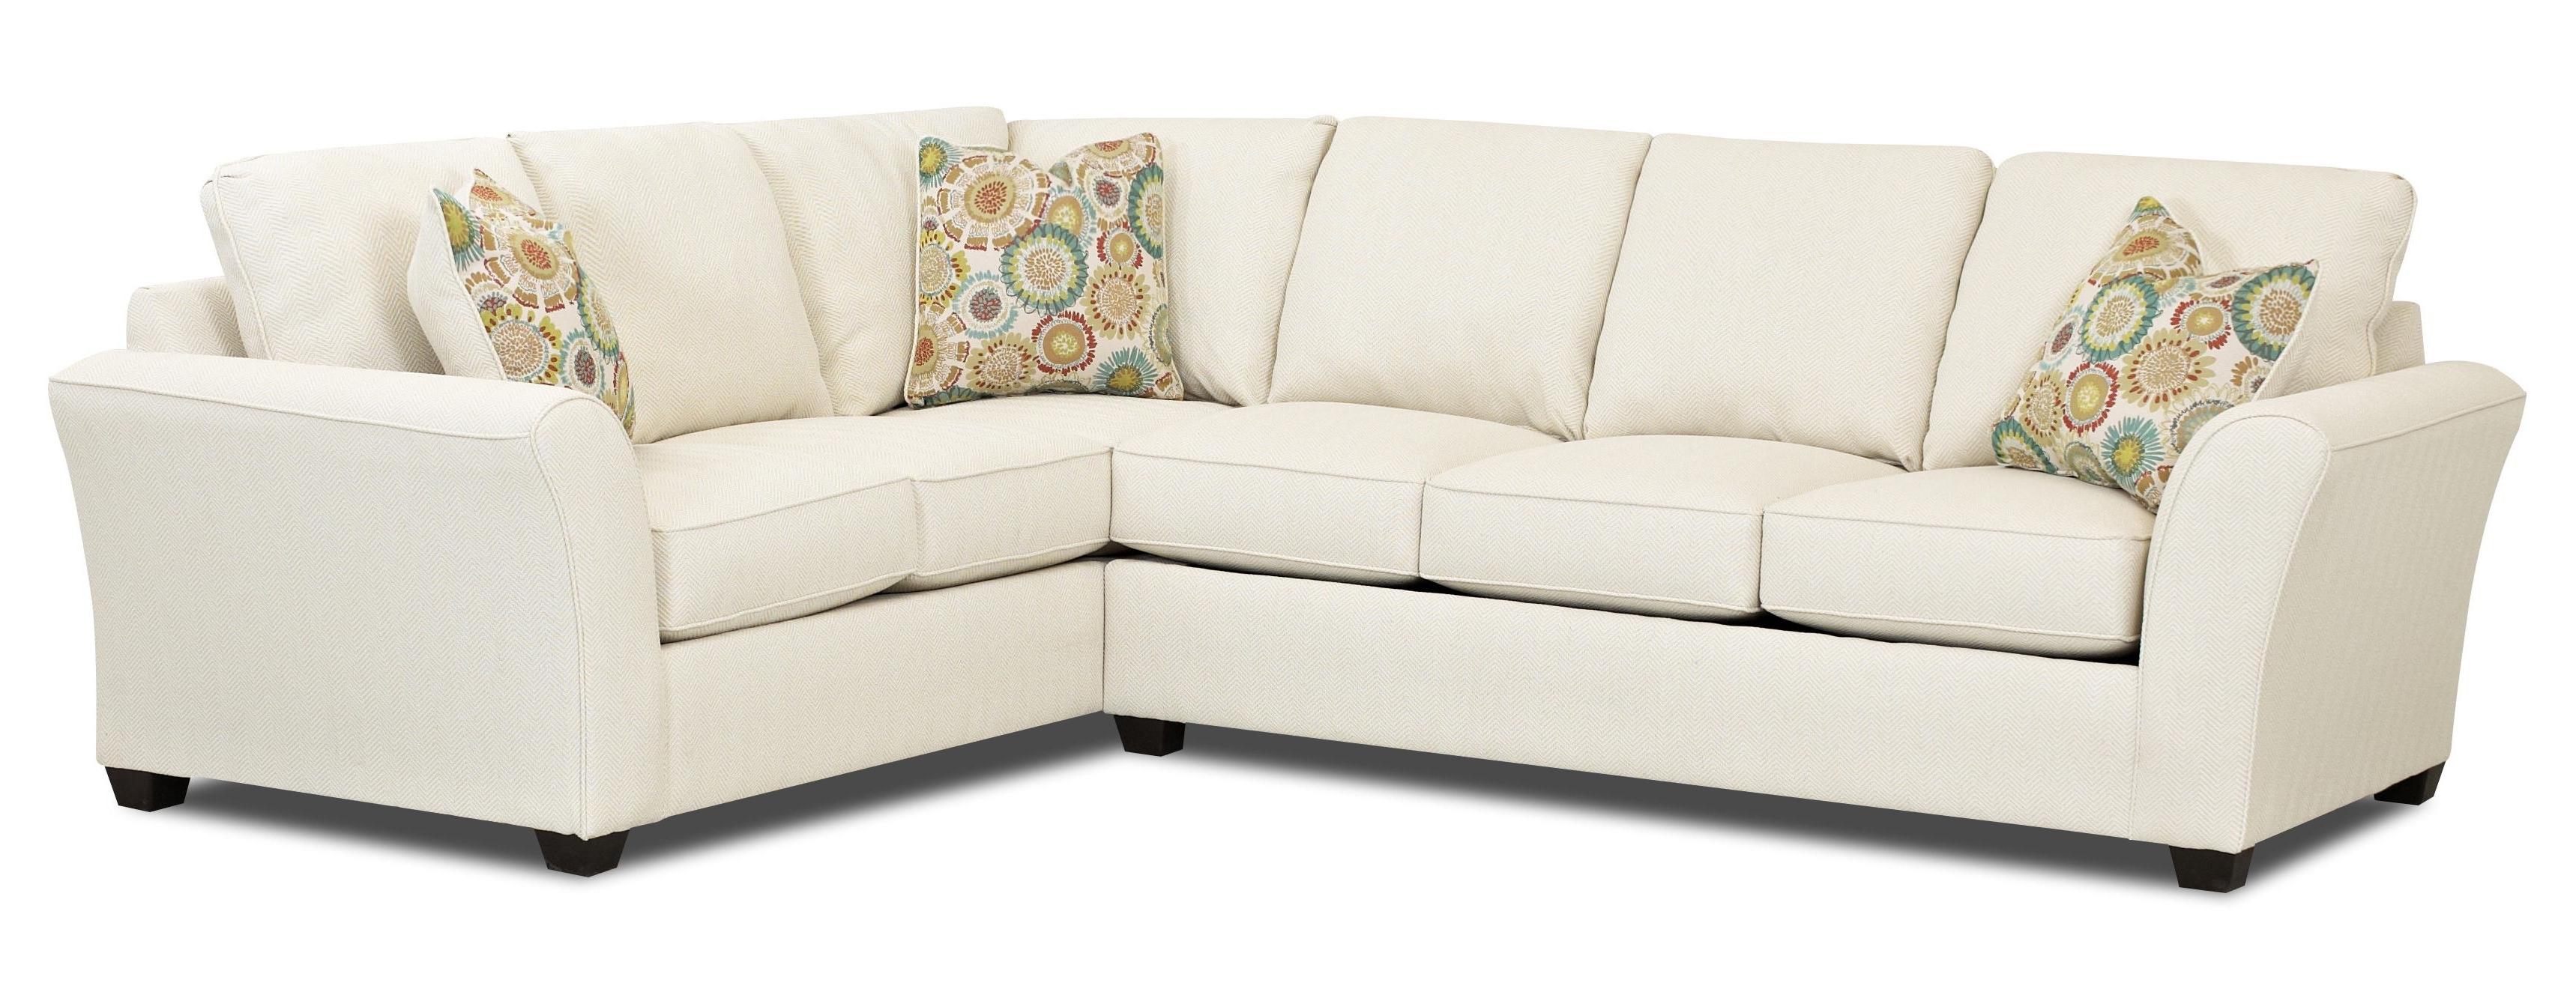 L Shaped Sectional Sleeper Sofas Regarding Current Transitional Sectional Sleeper Sofa With Dreamquest Mattress (View 10 of 15)